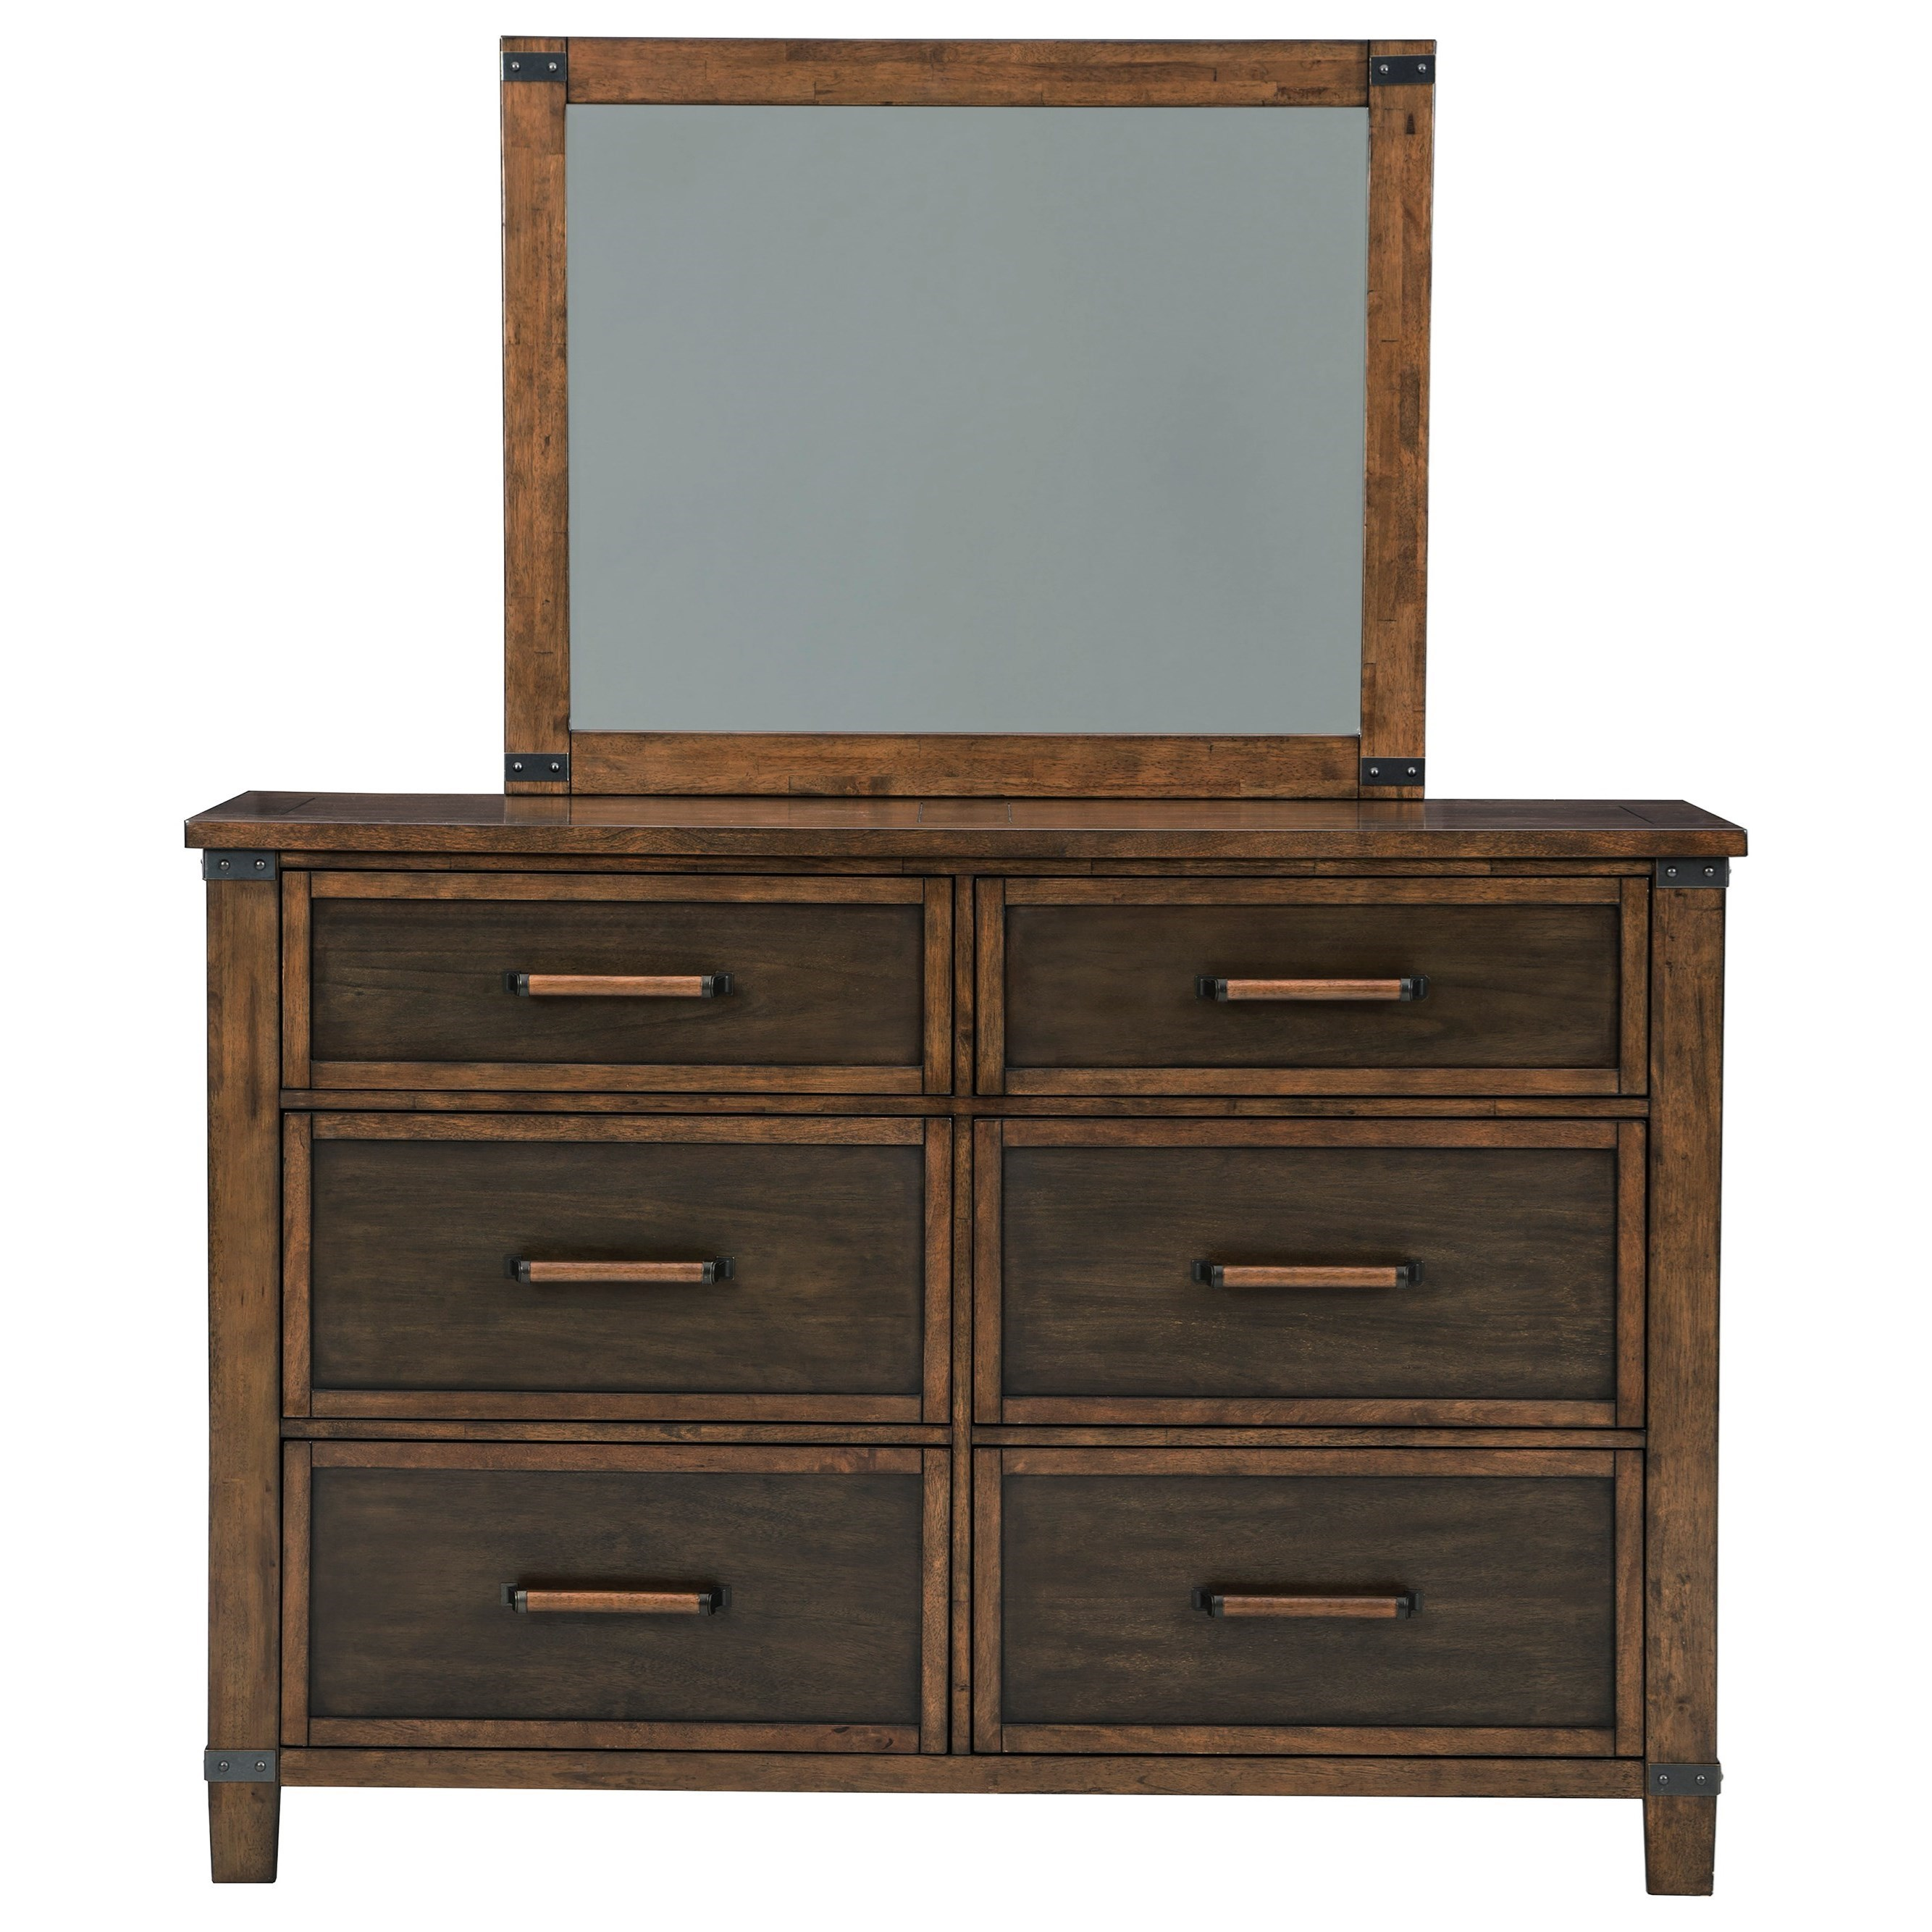 Two-Tone Mango Veneer Dresser & Bedroom Mirror